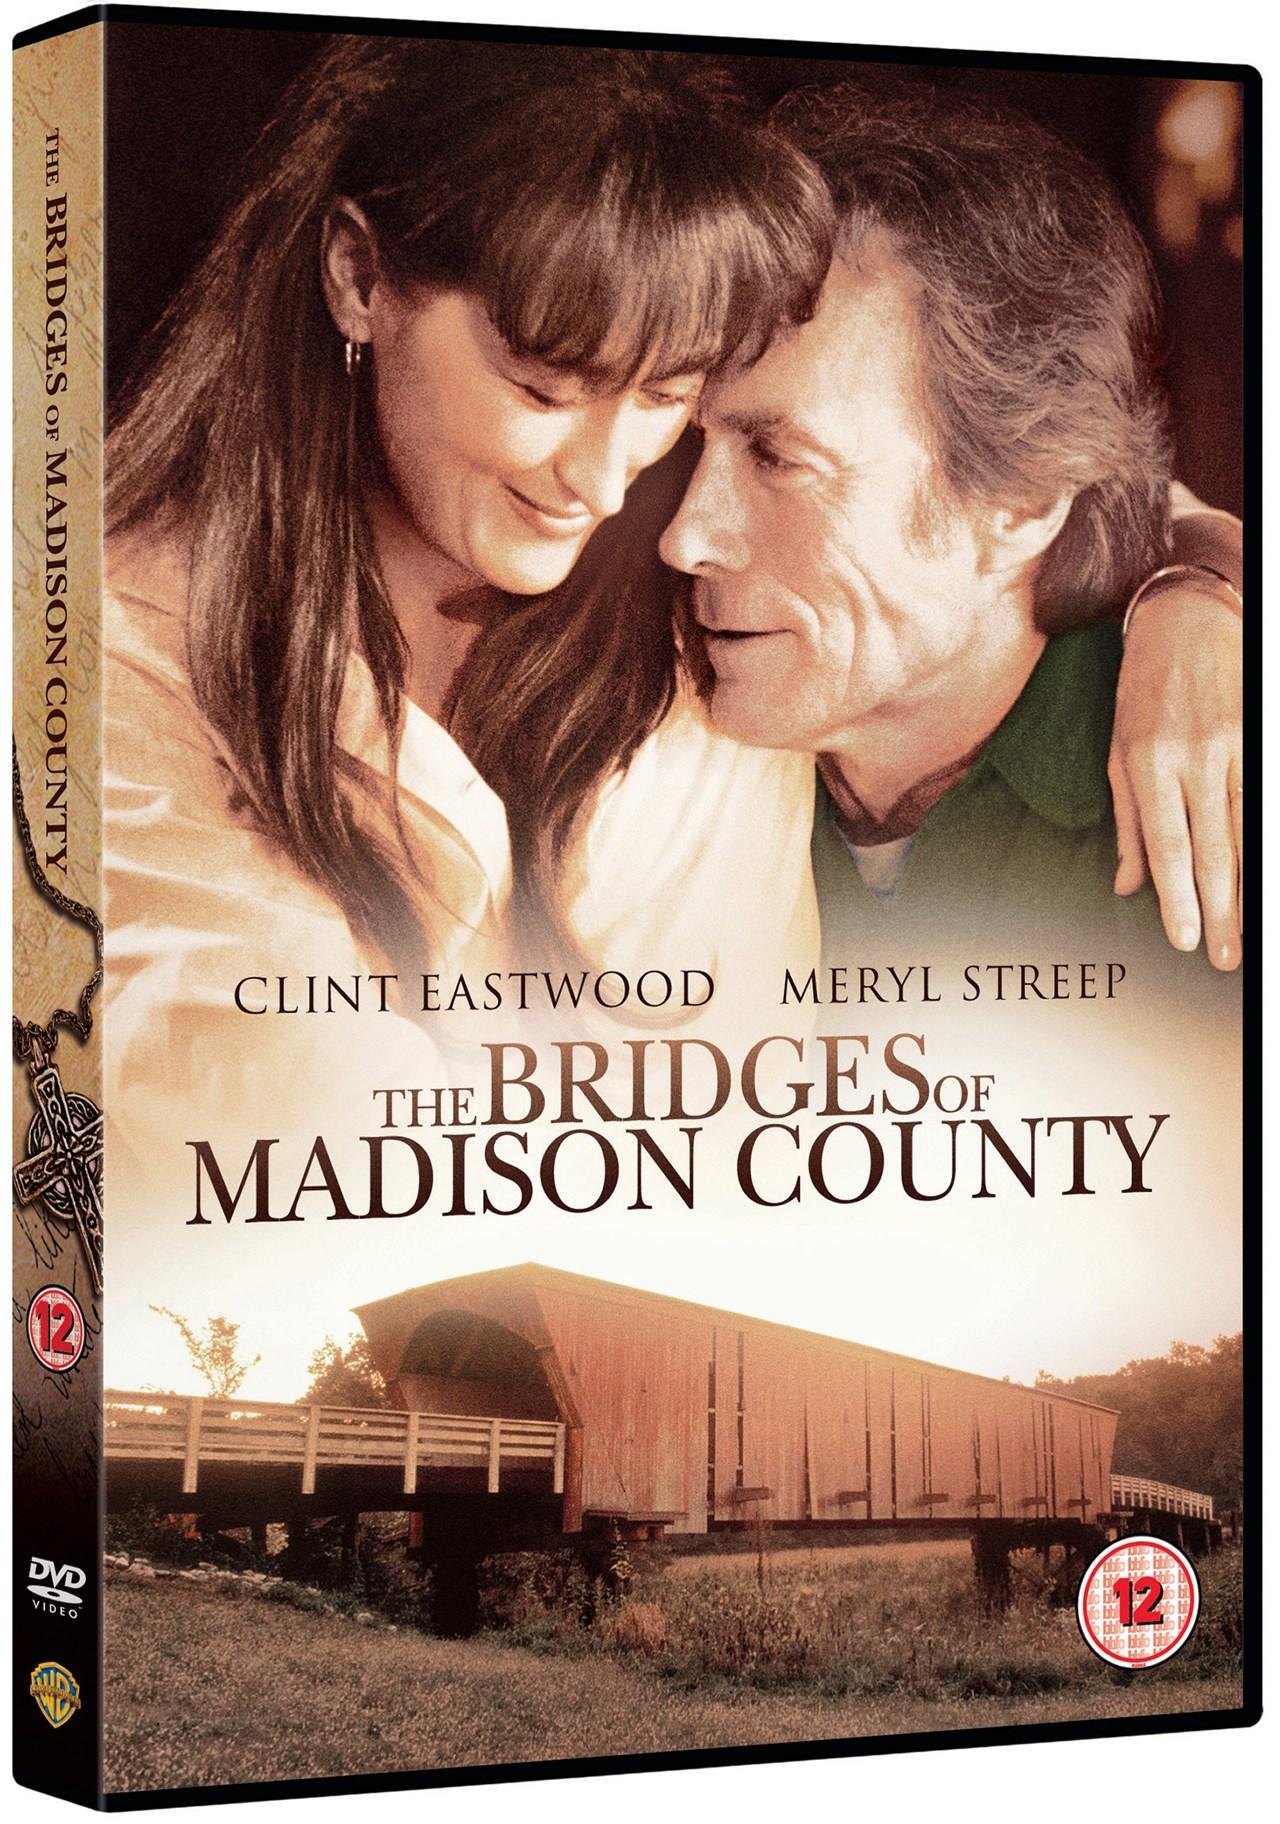 The Bridges of Madison County - 2